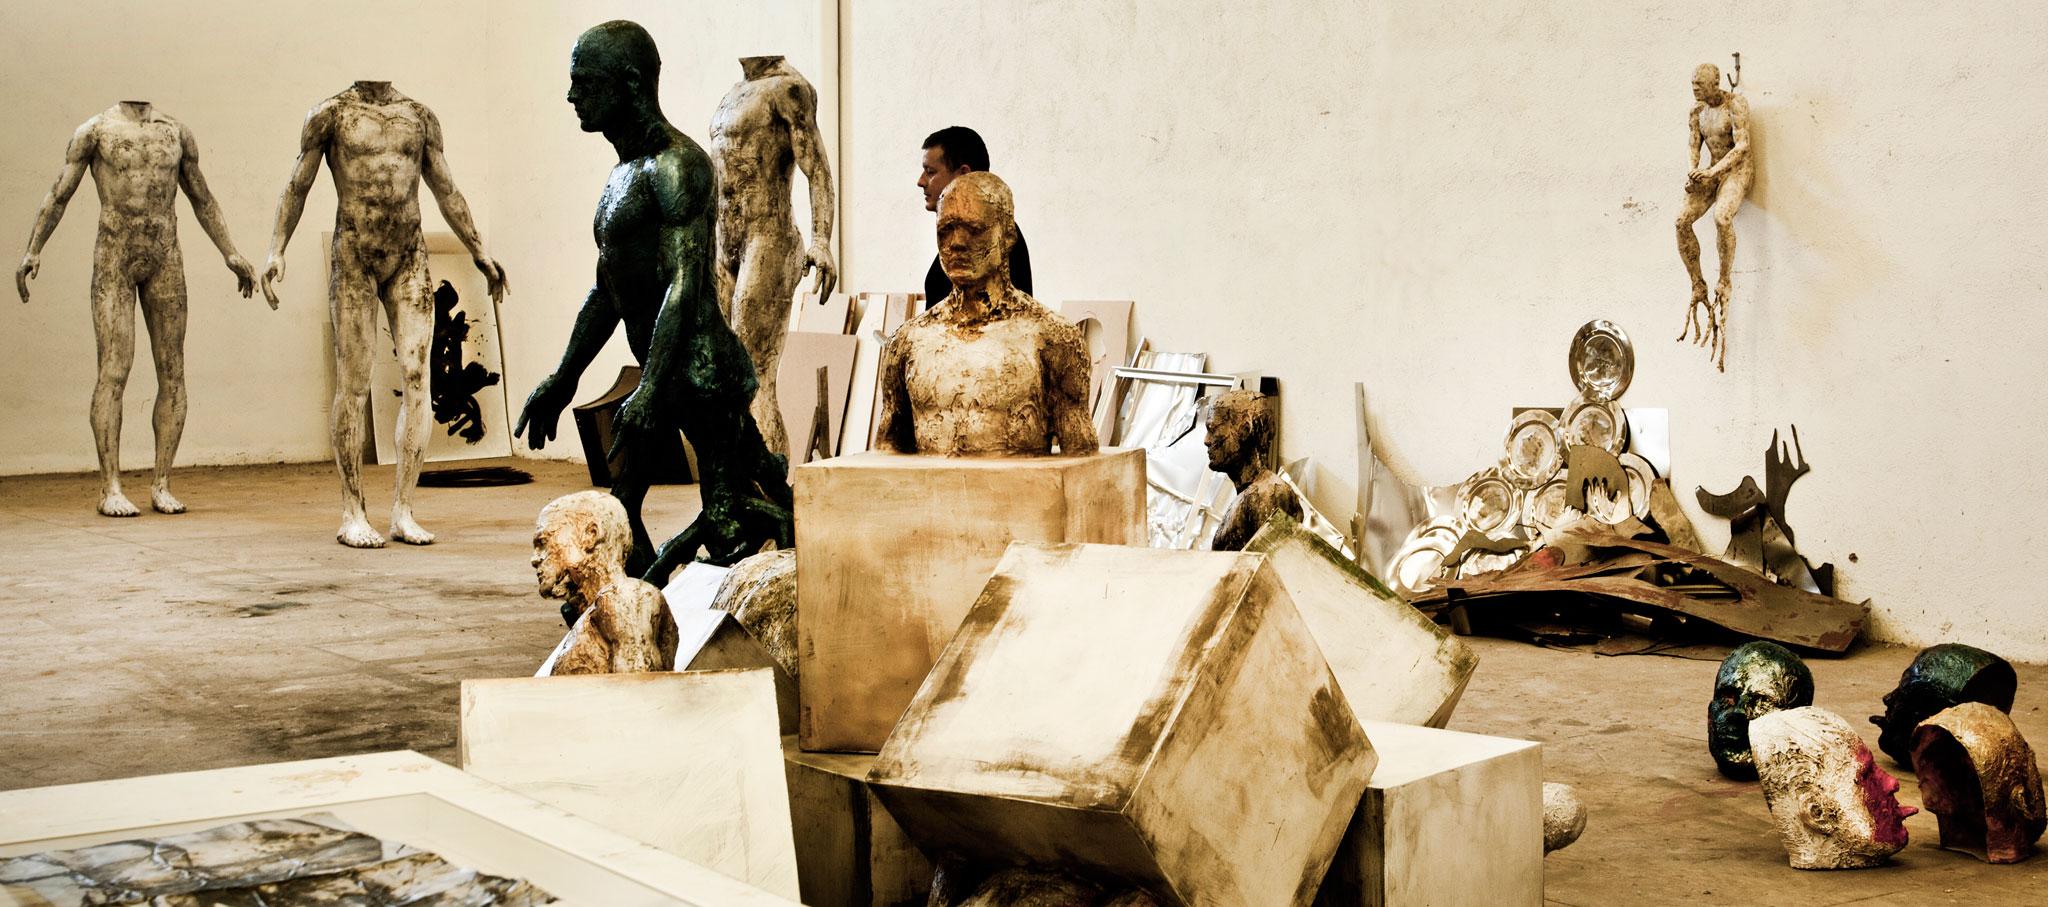 Estudio de Damià Díaz. Imagen cortesía de Mostra Espanha